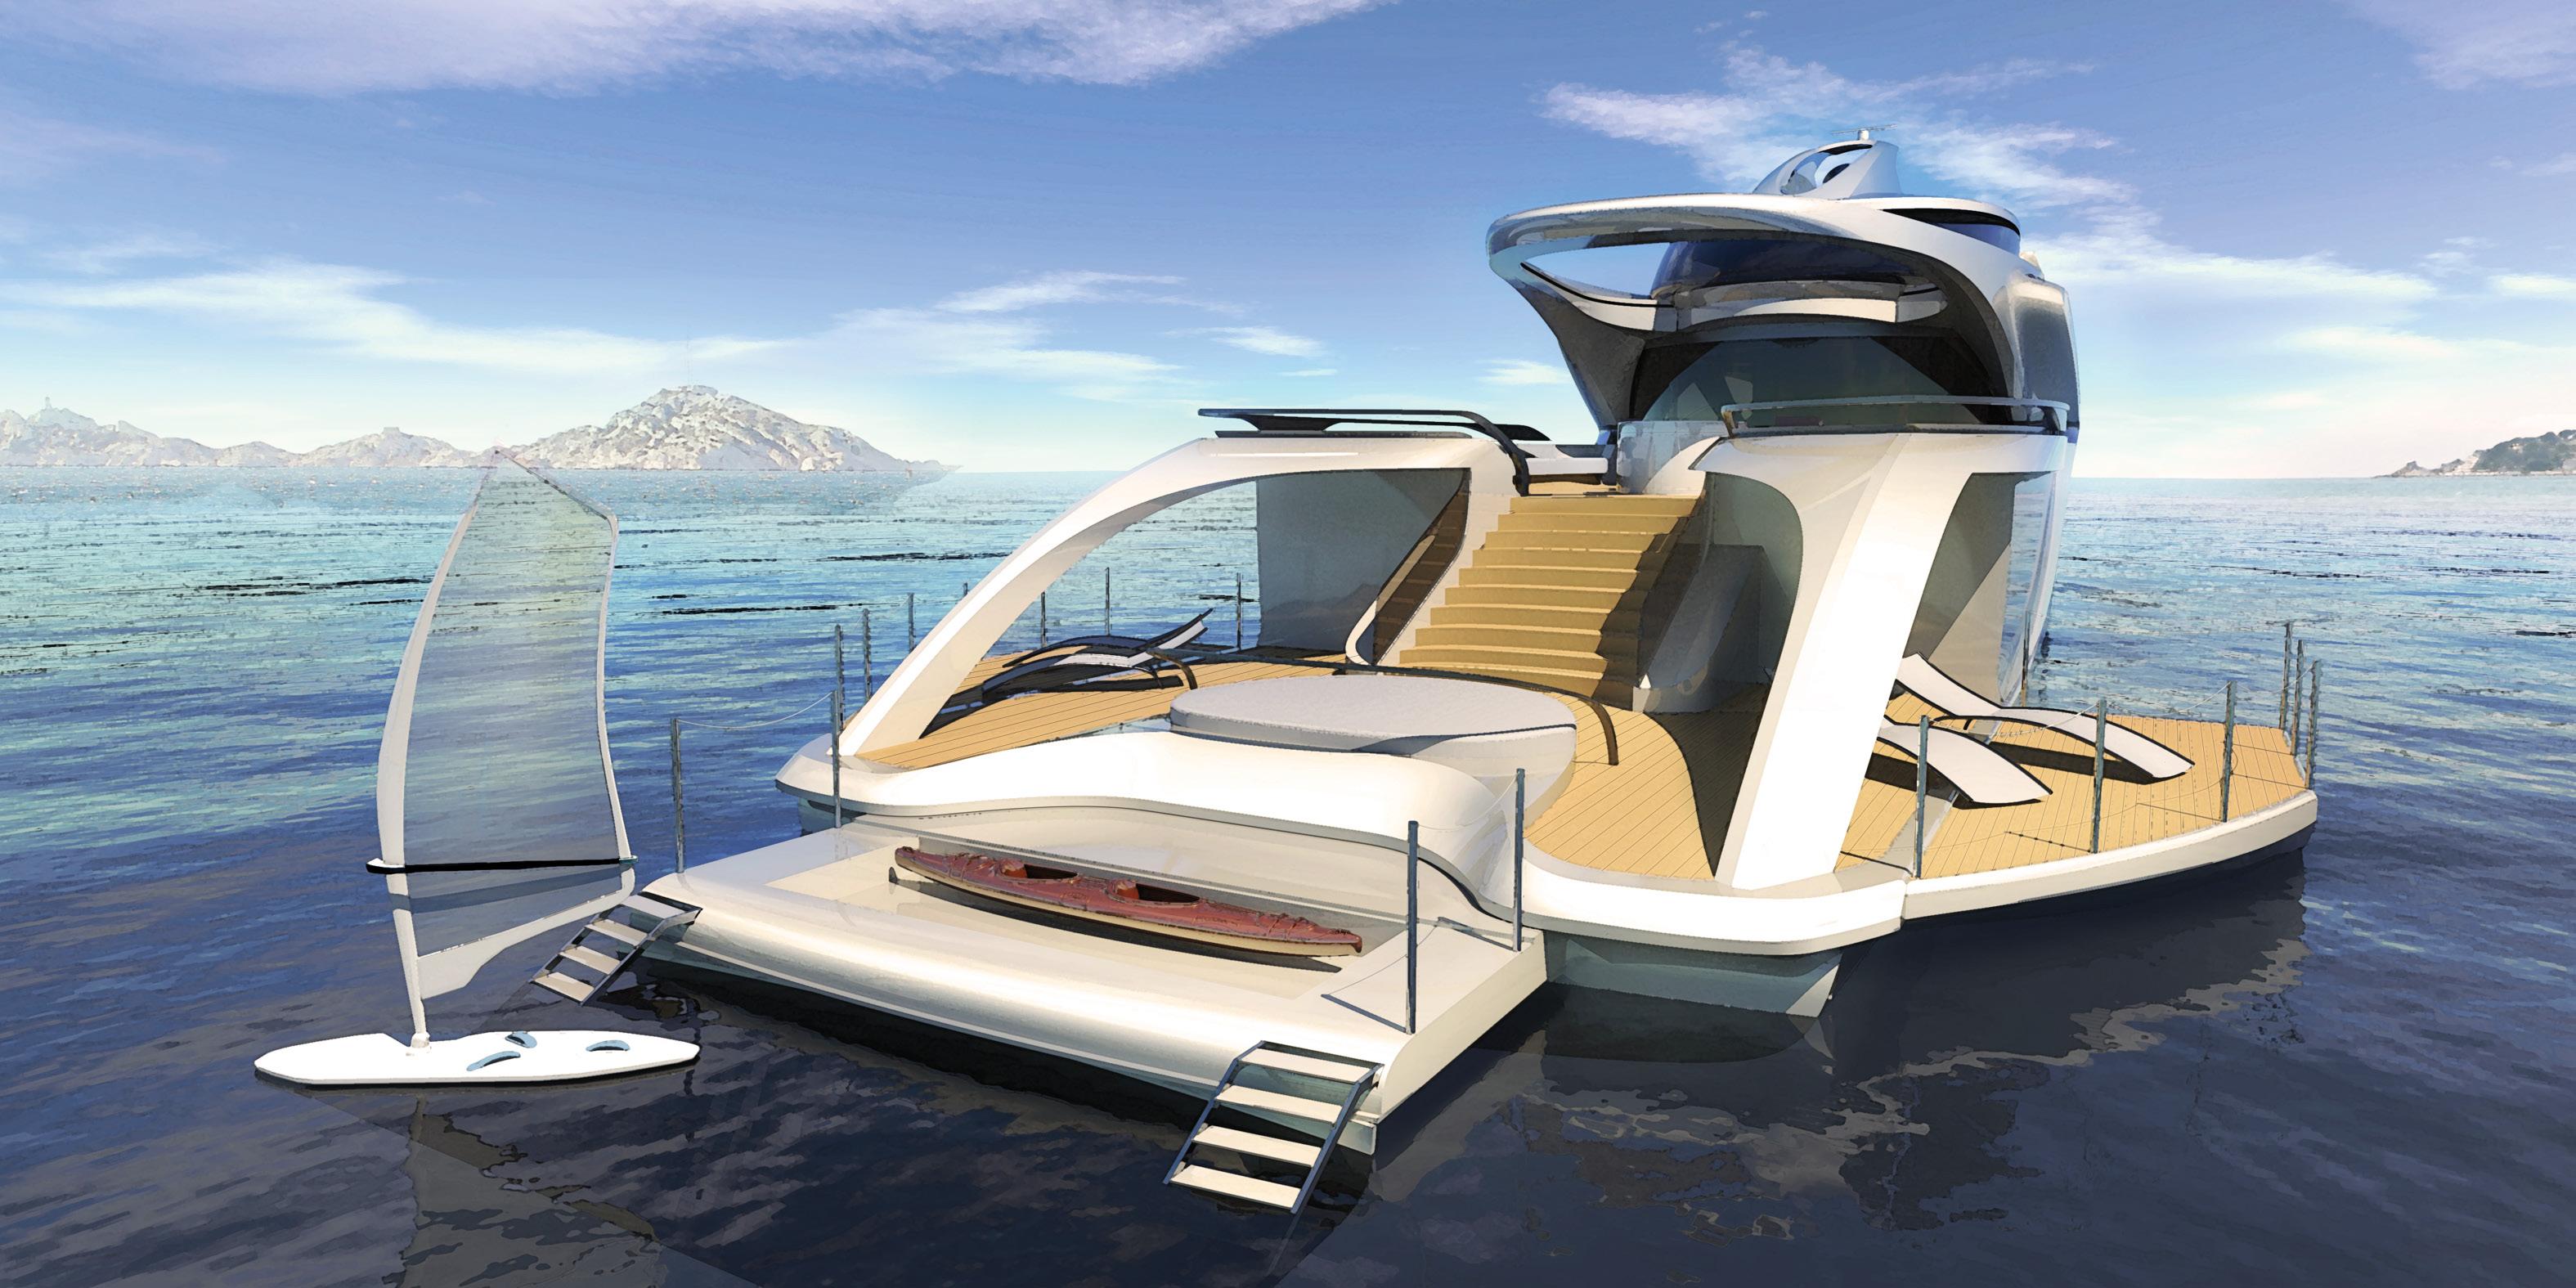 Luxury Superyacht concept CERCIO designed by Baoqi Xiao